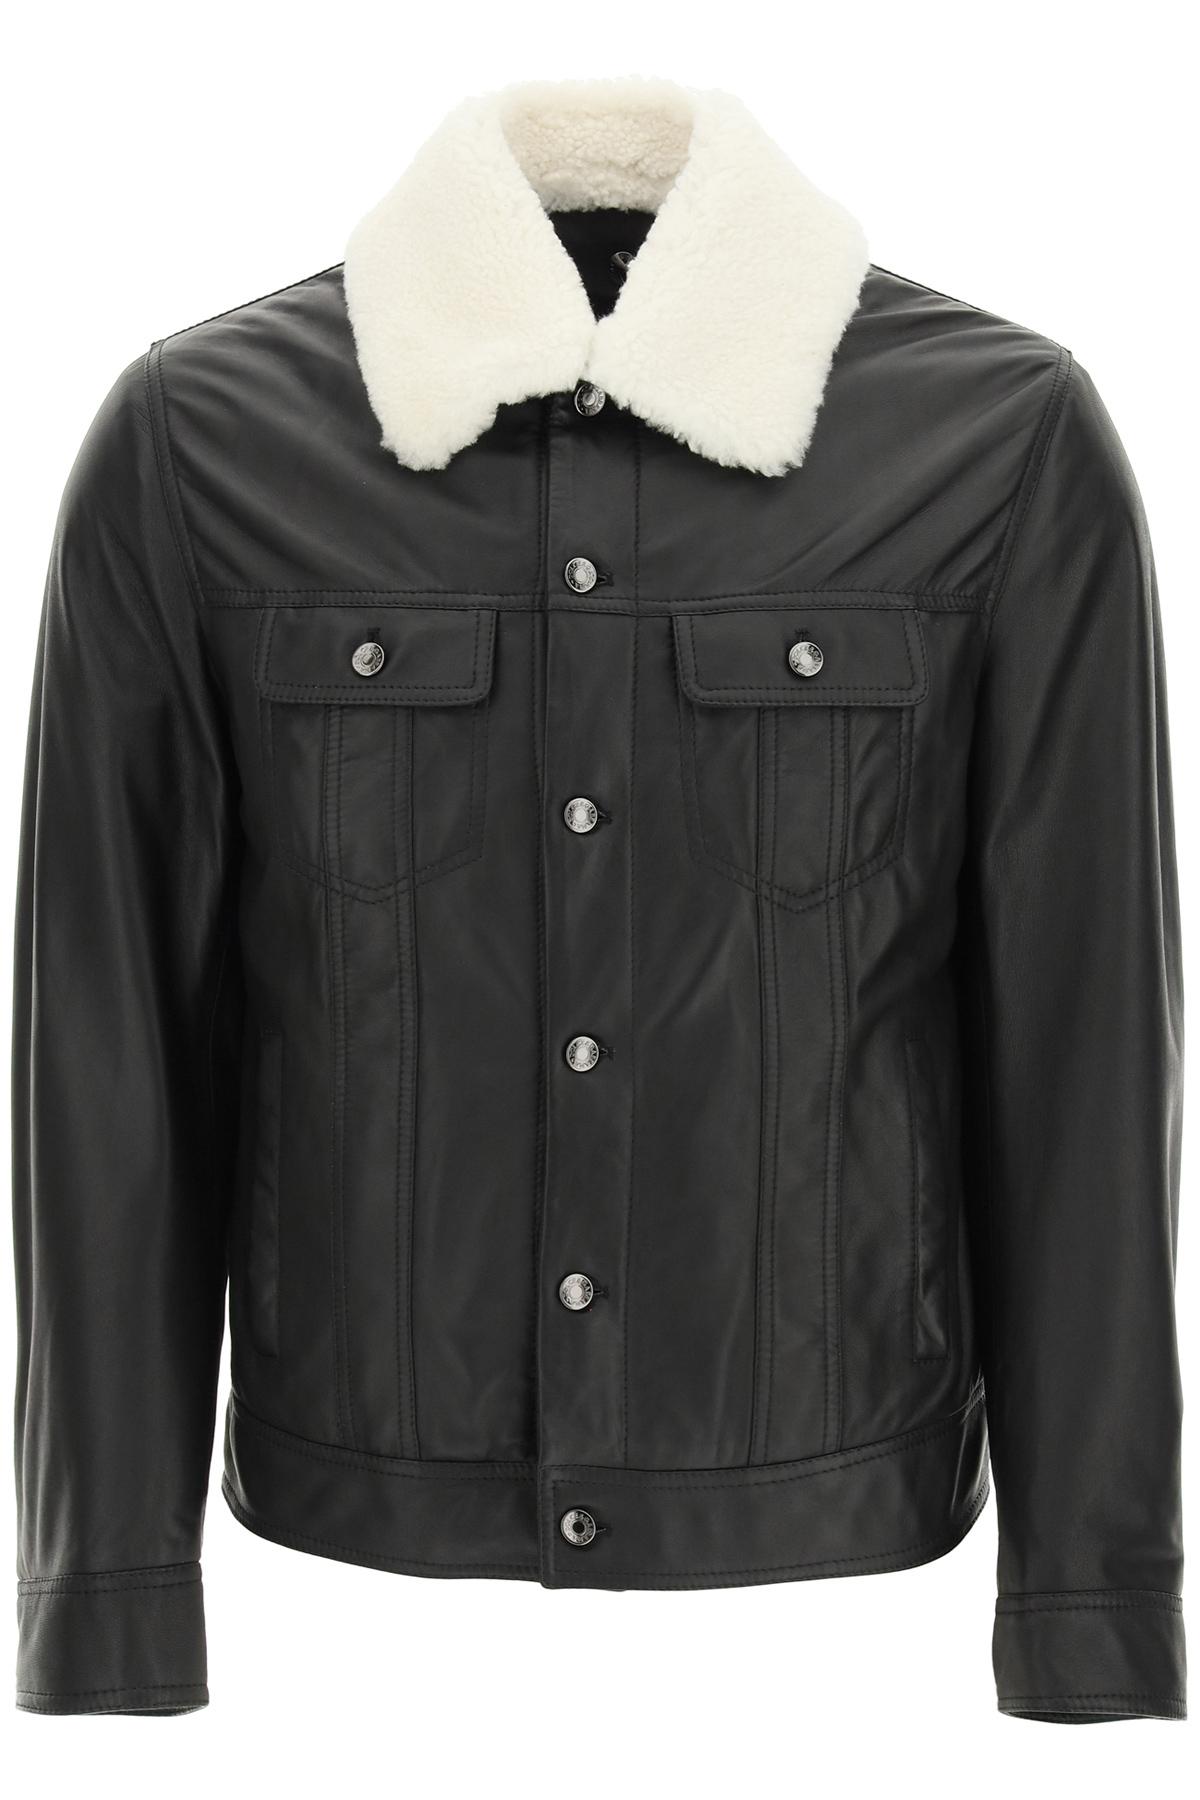 Dolce & gabbana giacca da aviatore in pelle di agnello